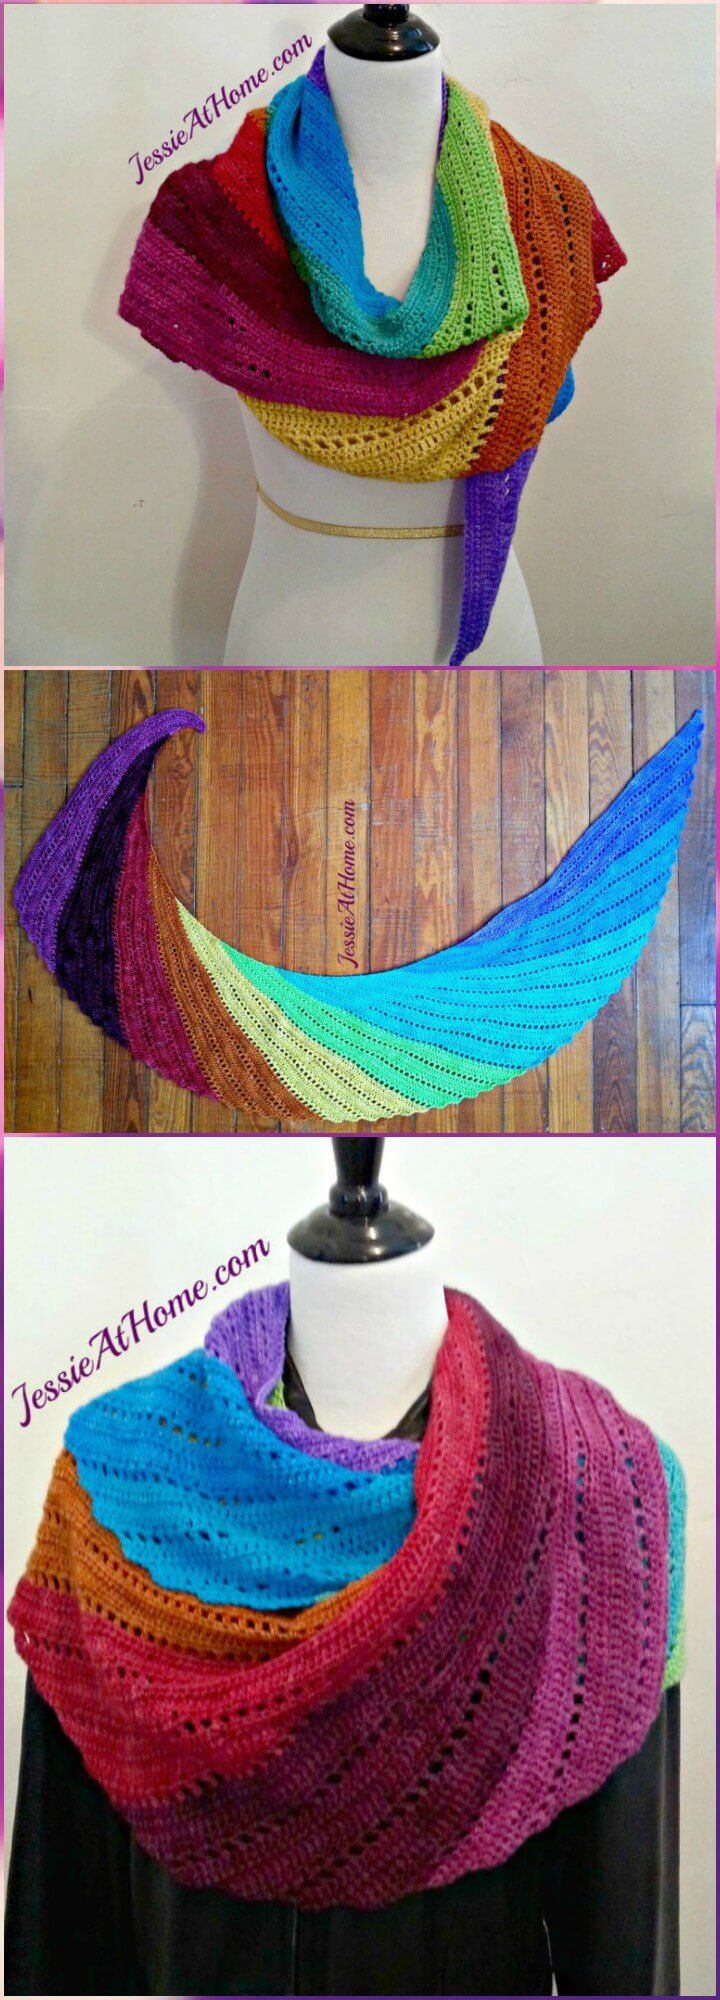 100 Free Crochet Shawl Patterns - Free Crochet Patterns - Page 11 of 19 - DIY & Crafts